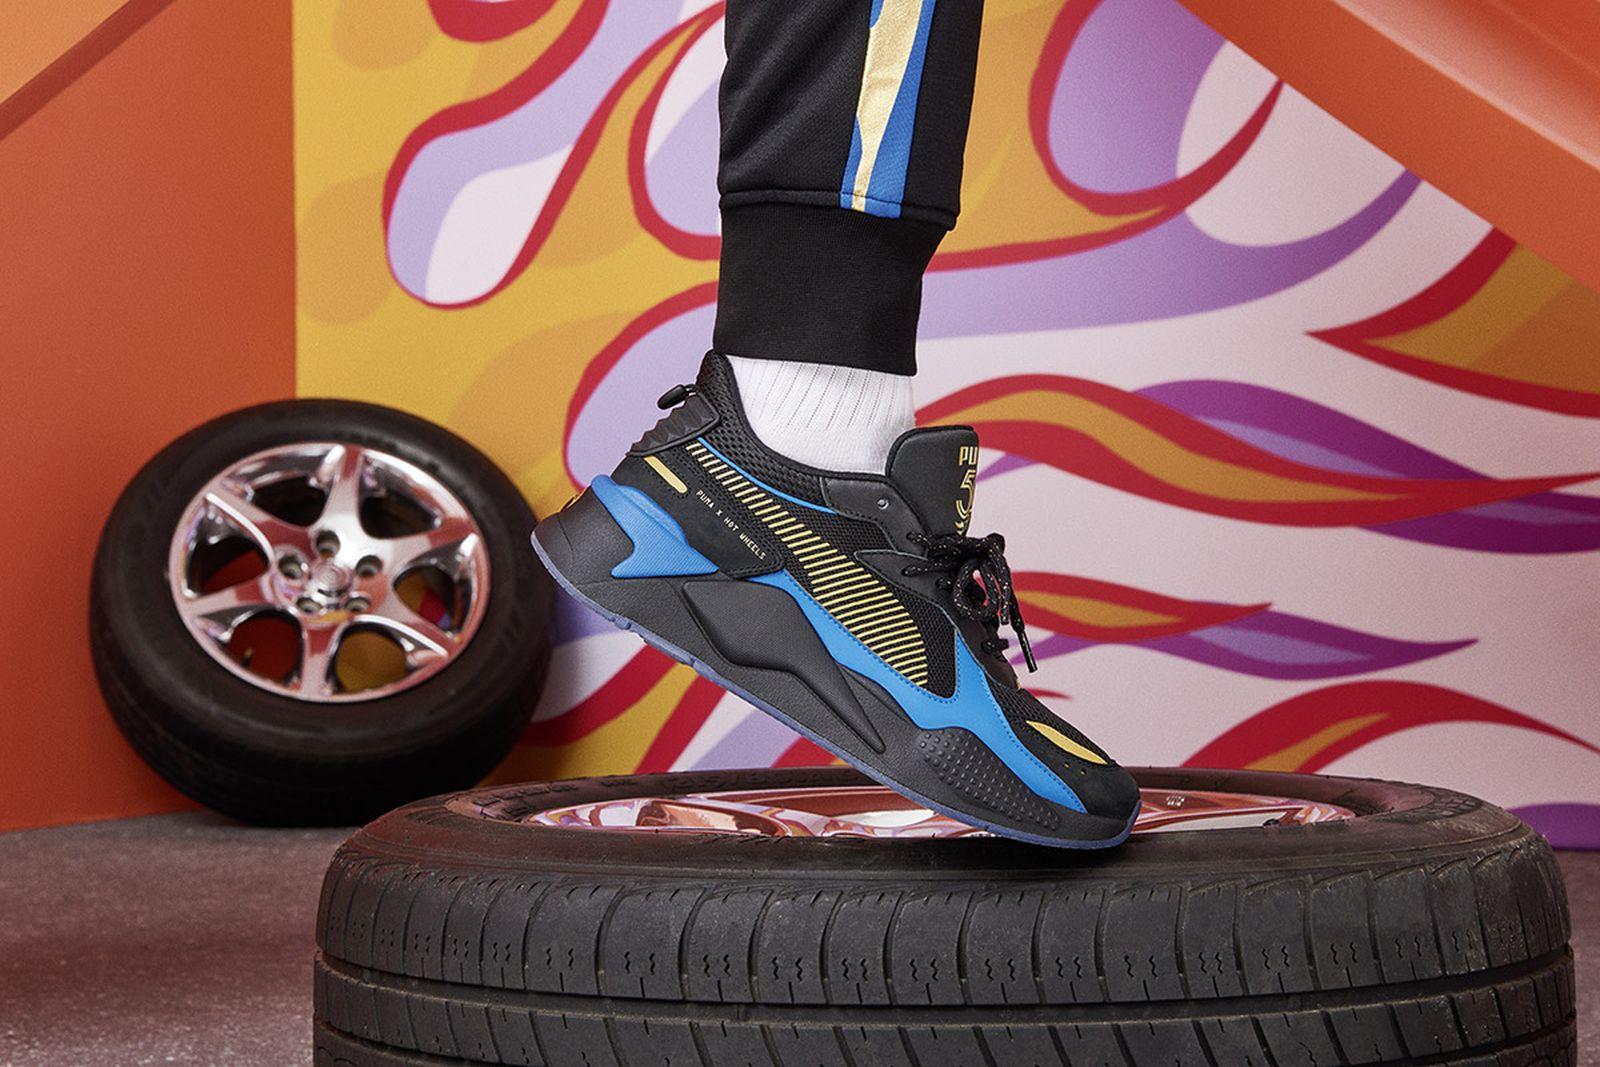 Mattel X Puma Rs X Hot Wheels Release Date Price More Info